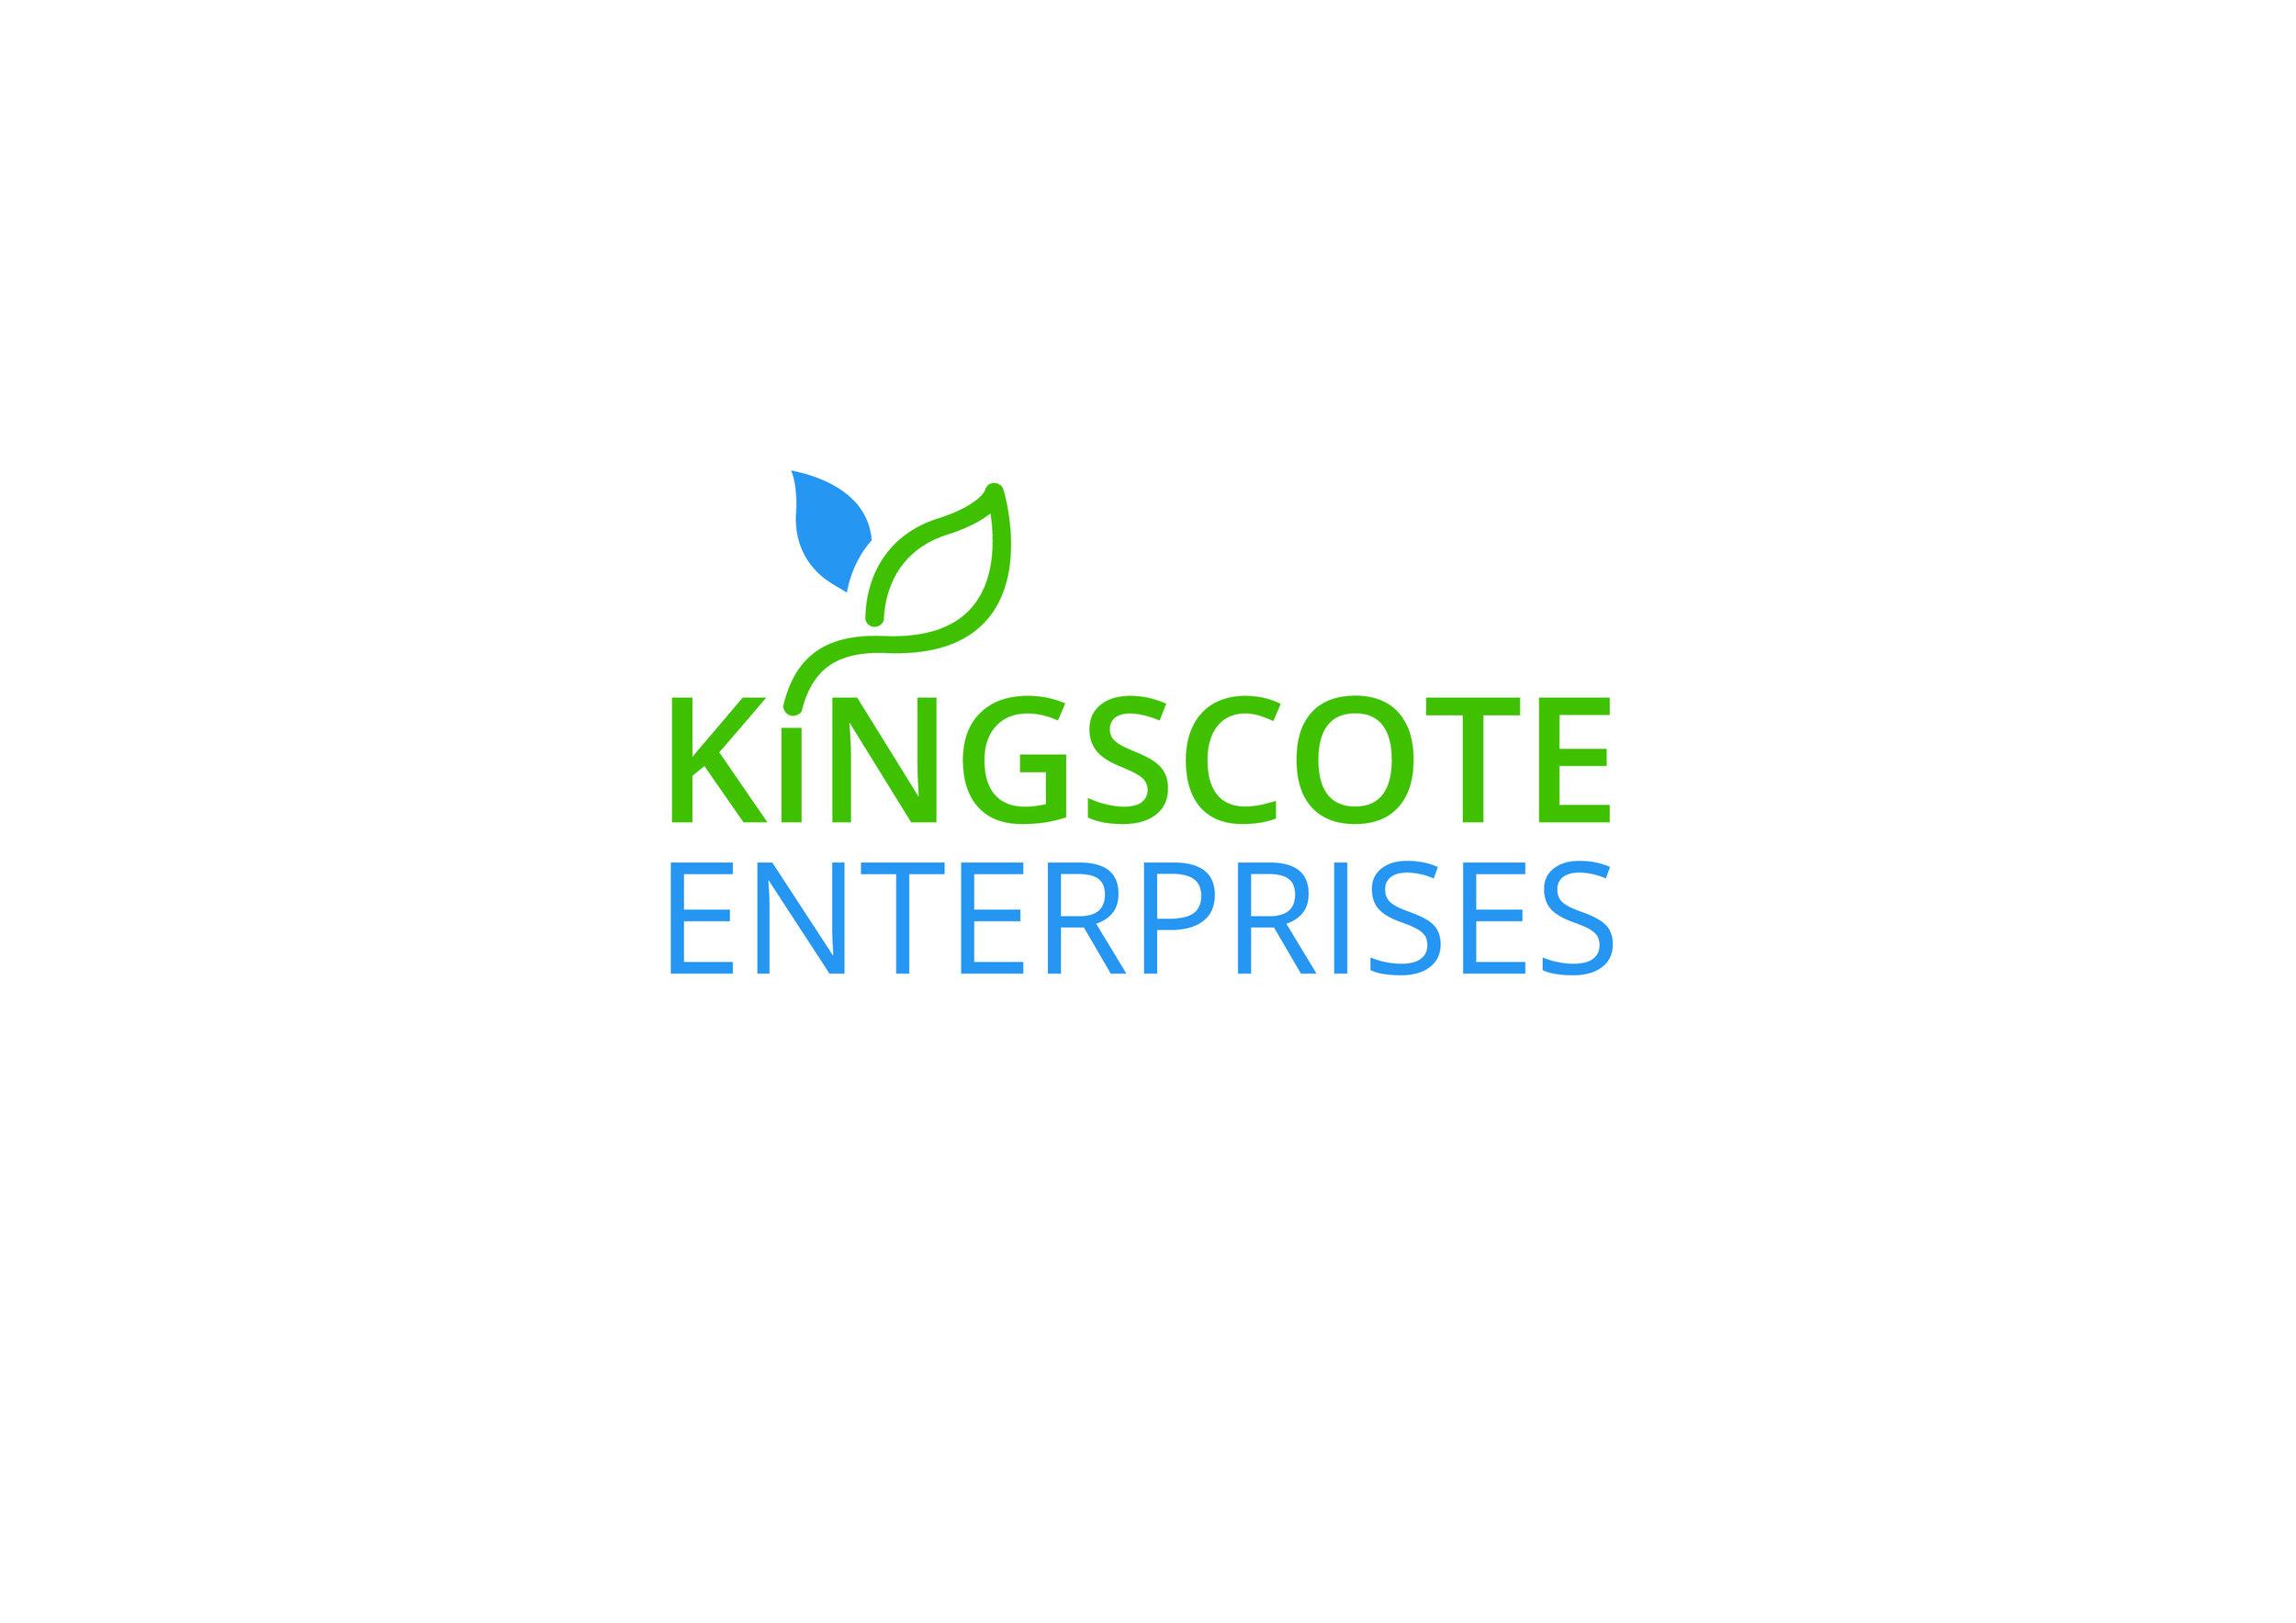 Kingscote-Logo.jpg